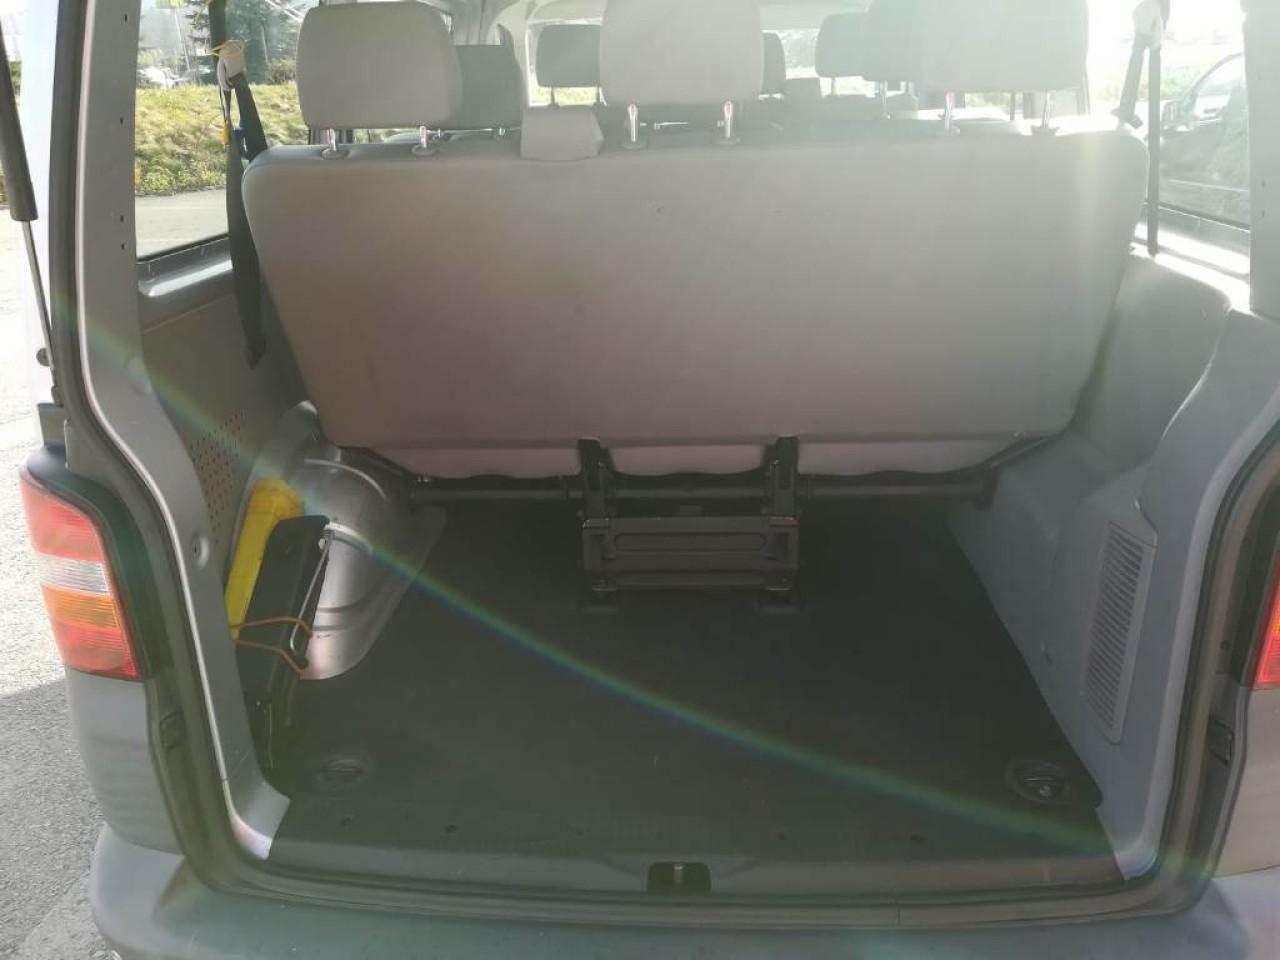 VW Caravelle 1.9 TDI 2009